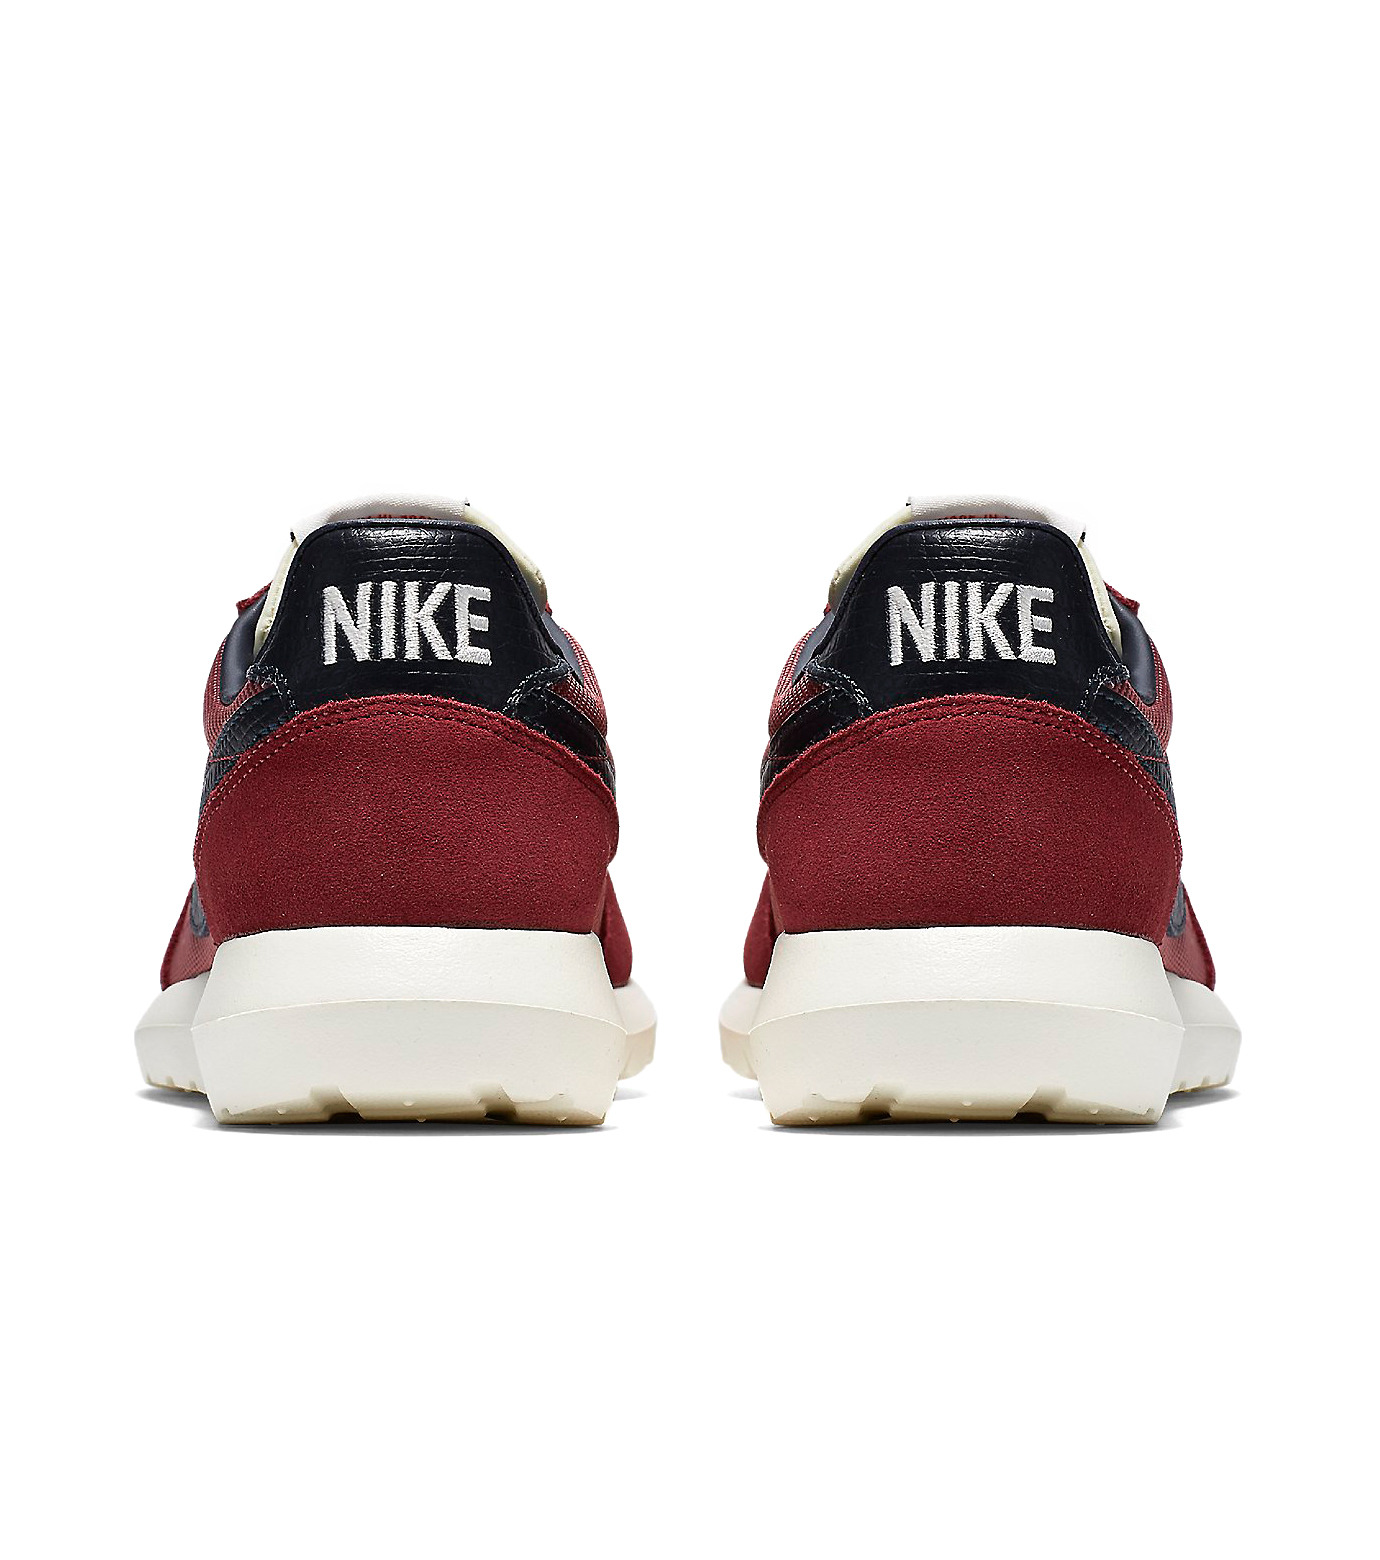 NIKE(ナイキ)のROSHE DBREAK NM-SMOKE PINK(シューズ/shoes)-826666-604-74 拡大詳細画像5